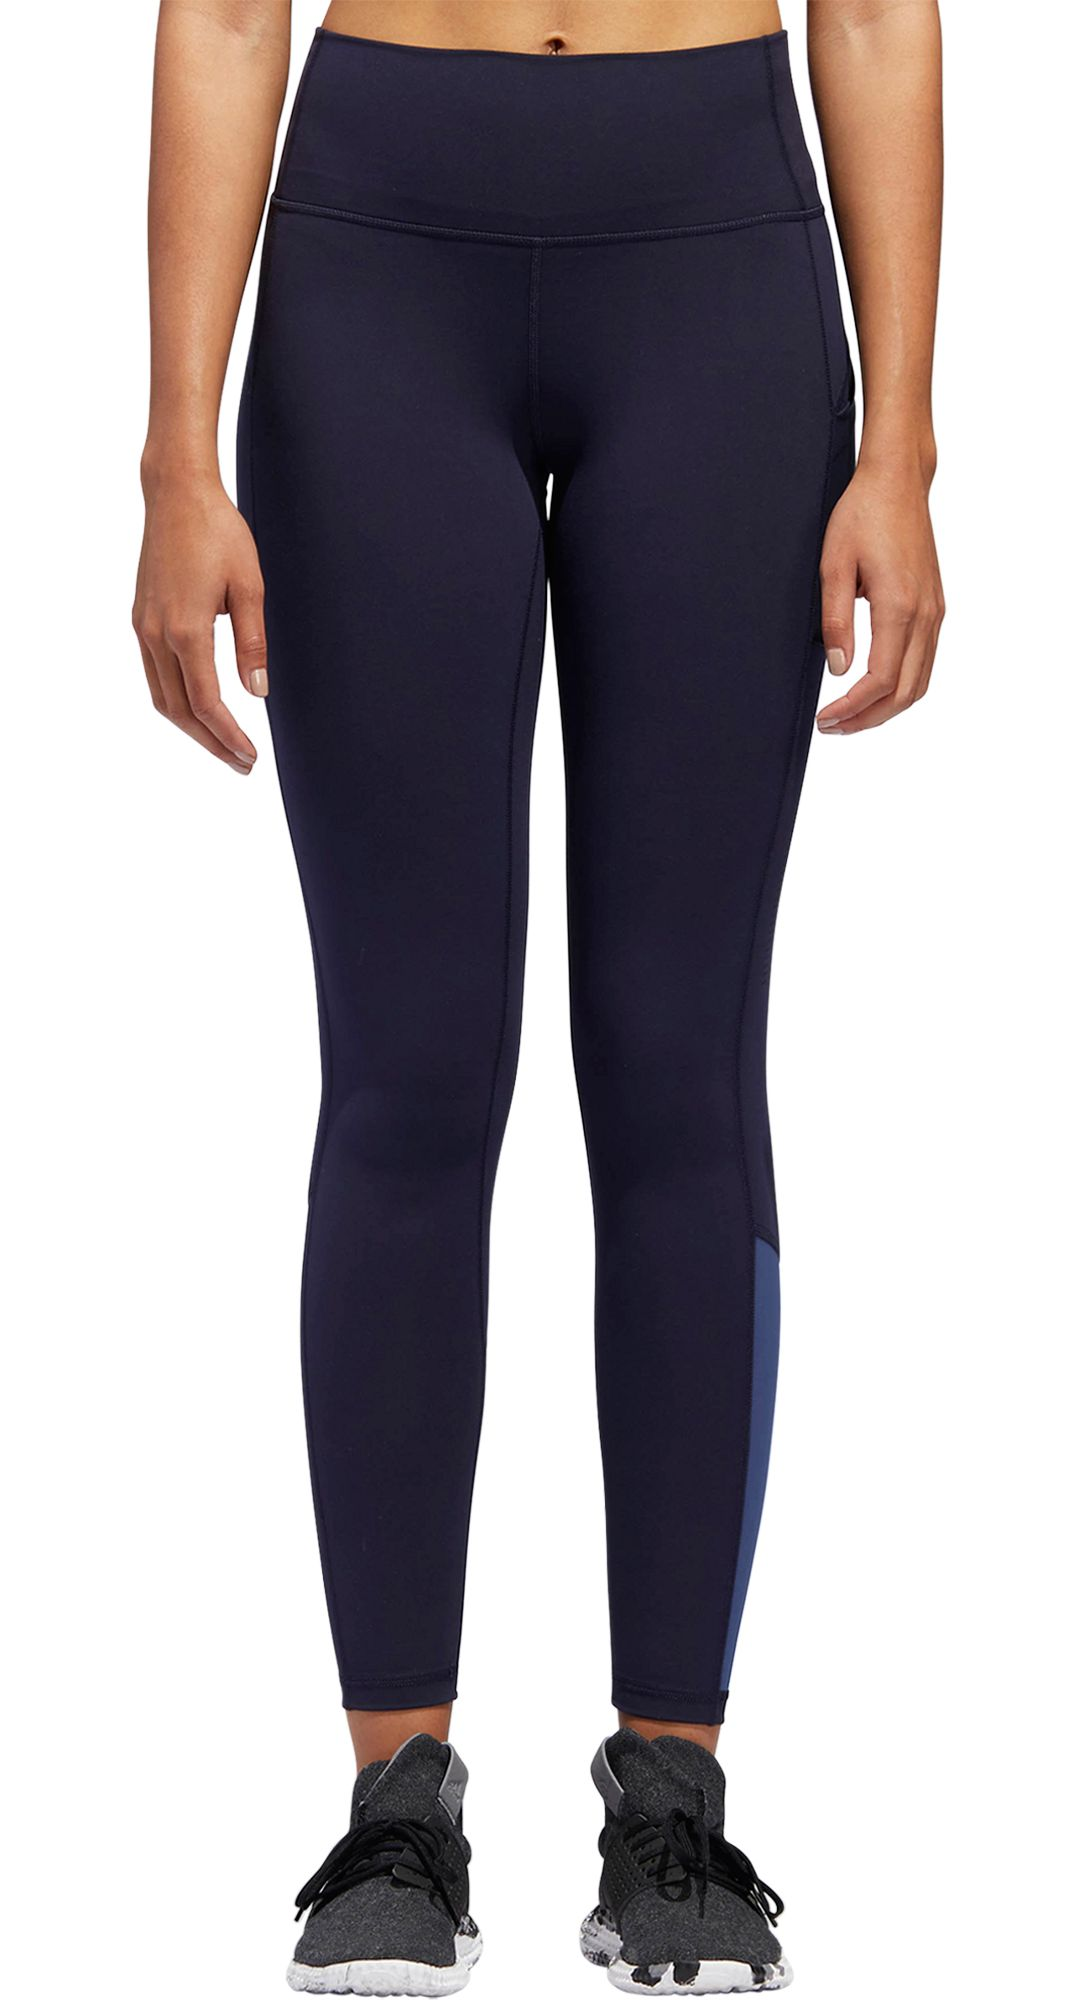 e94a7850b006be adidas Women's Believe This HR 7/8 Laser Focus Leggings | DICK'S ...